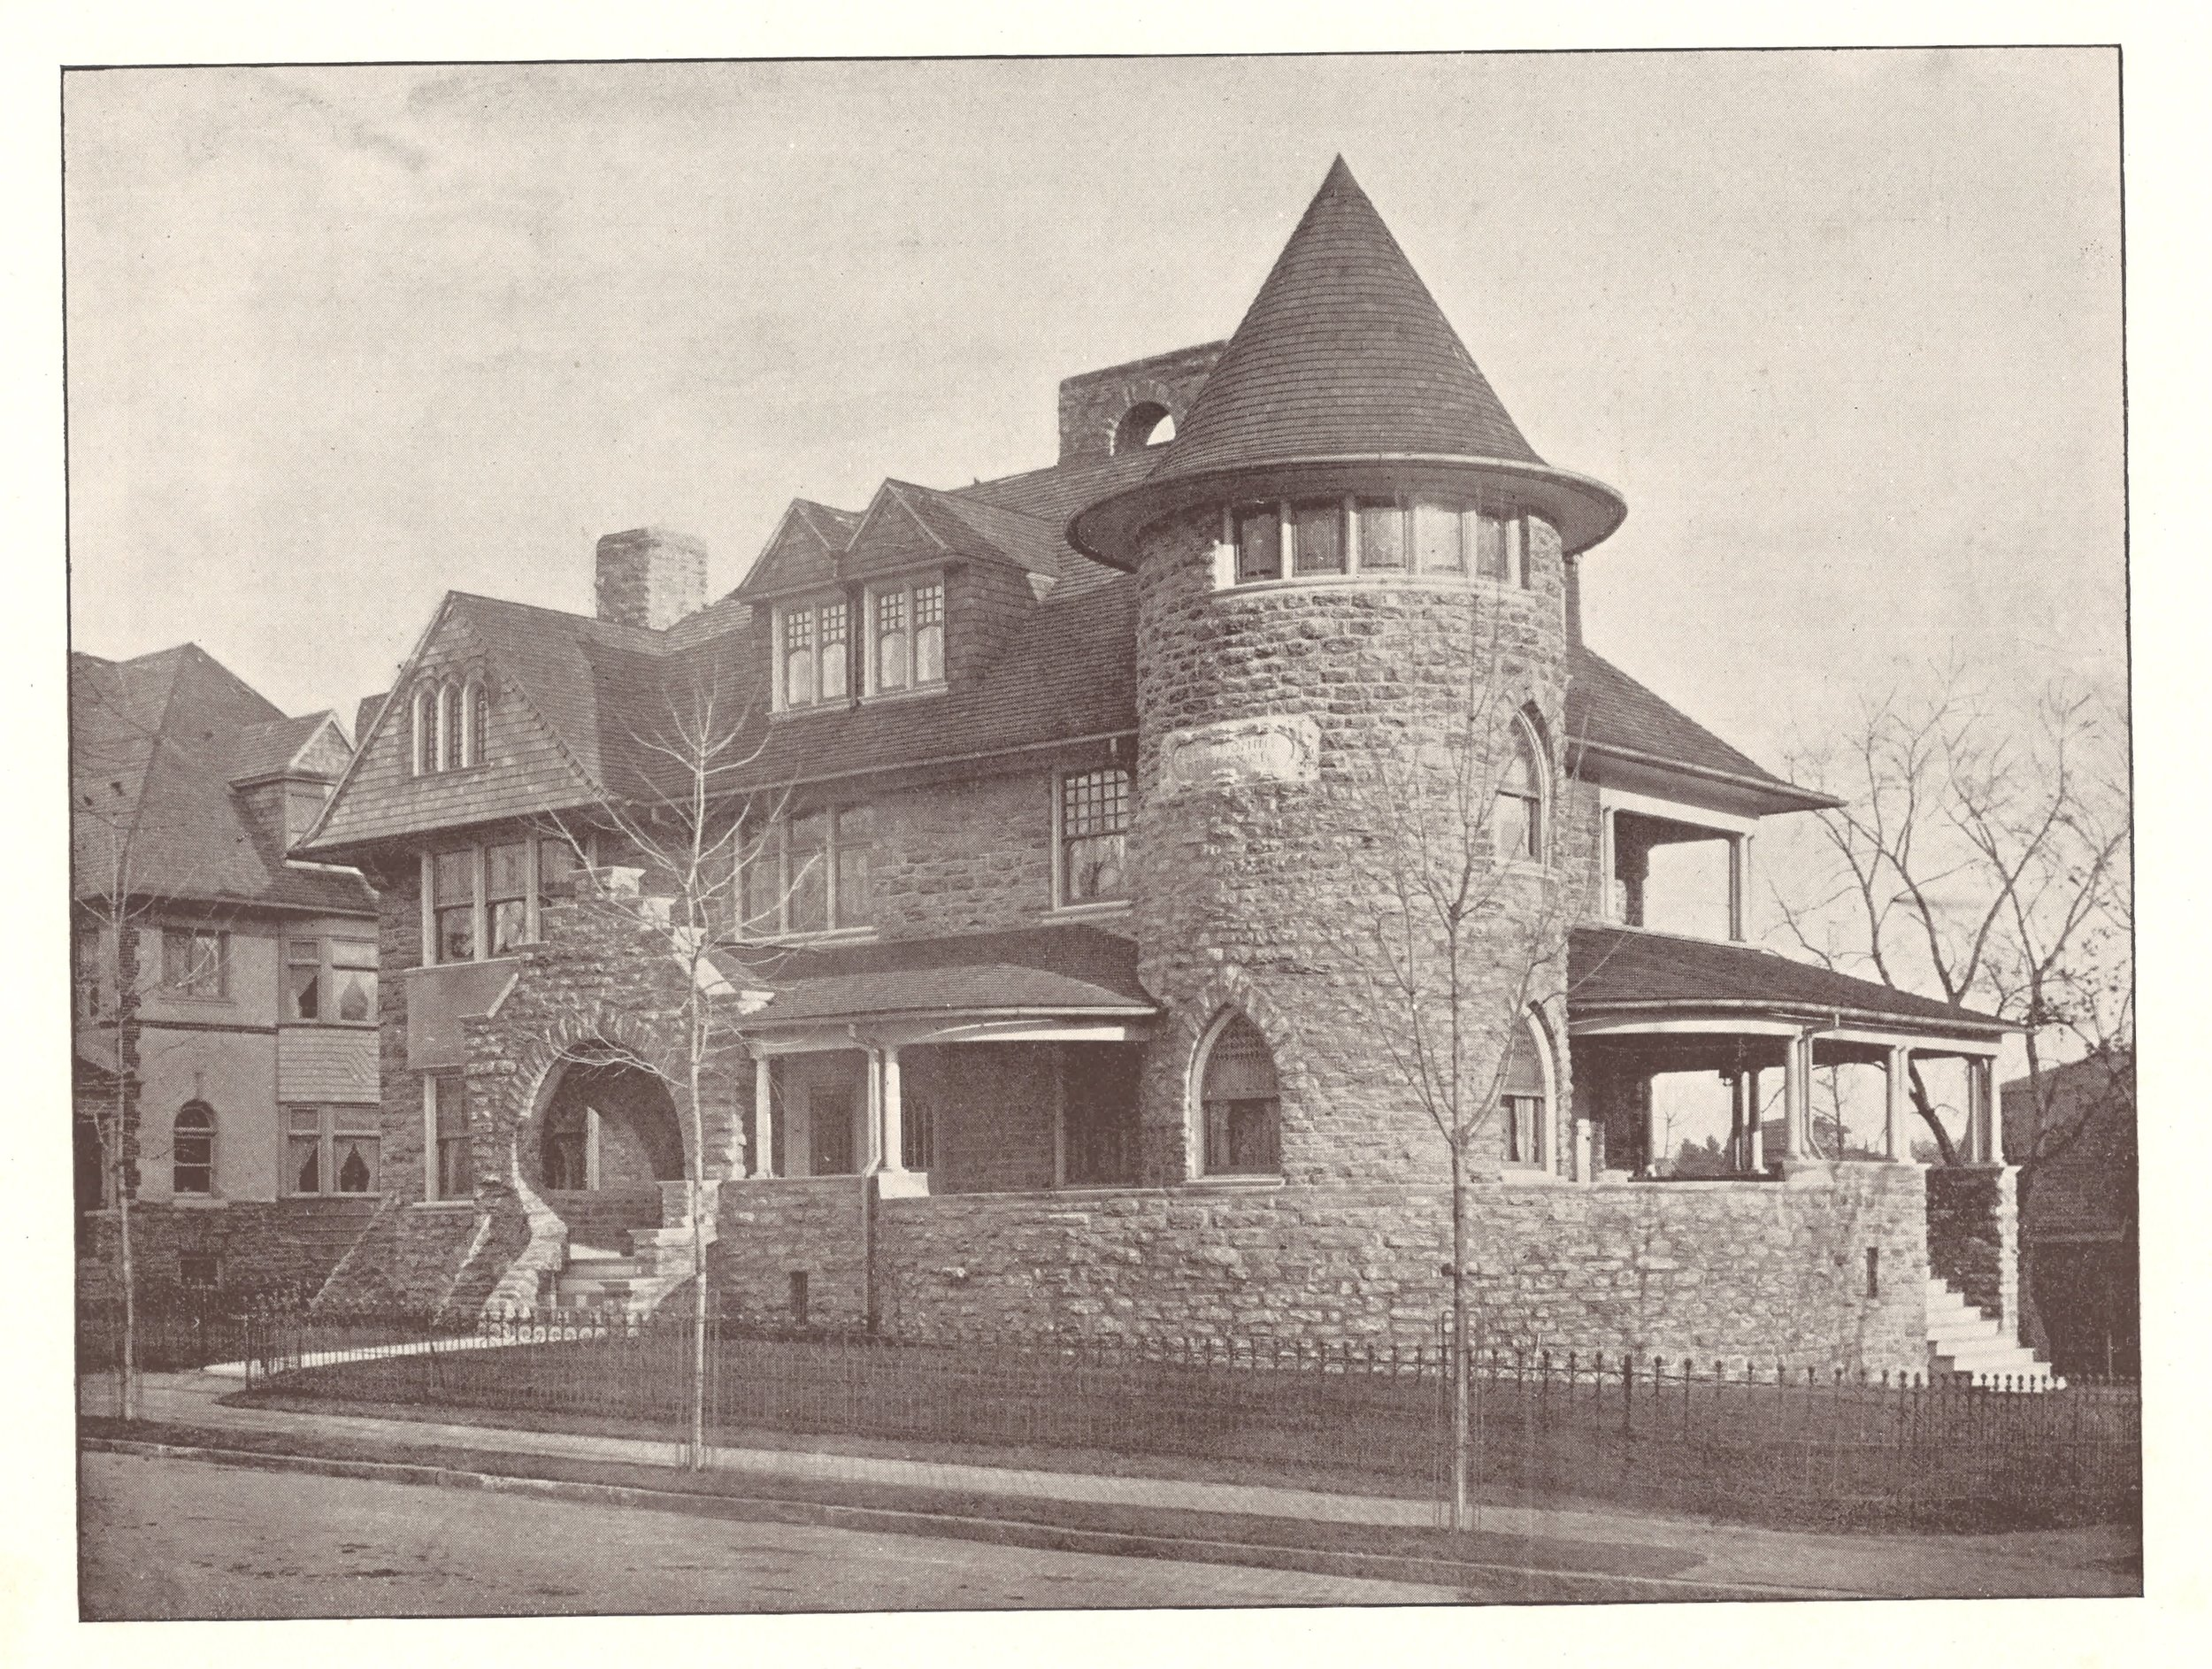 Germantown, PA home - 1894